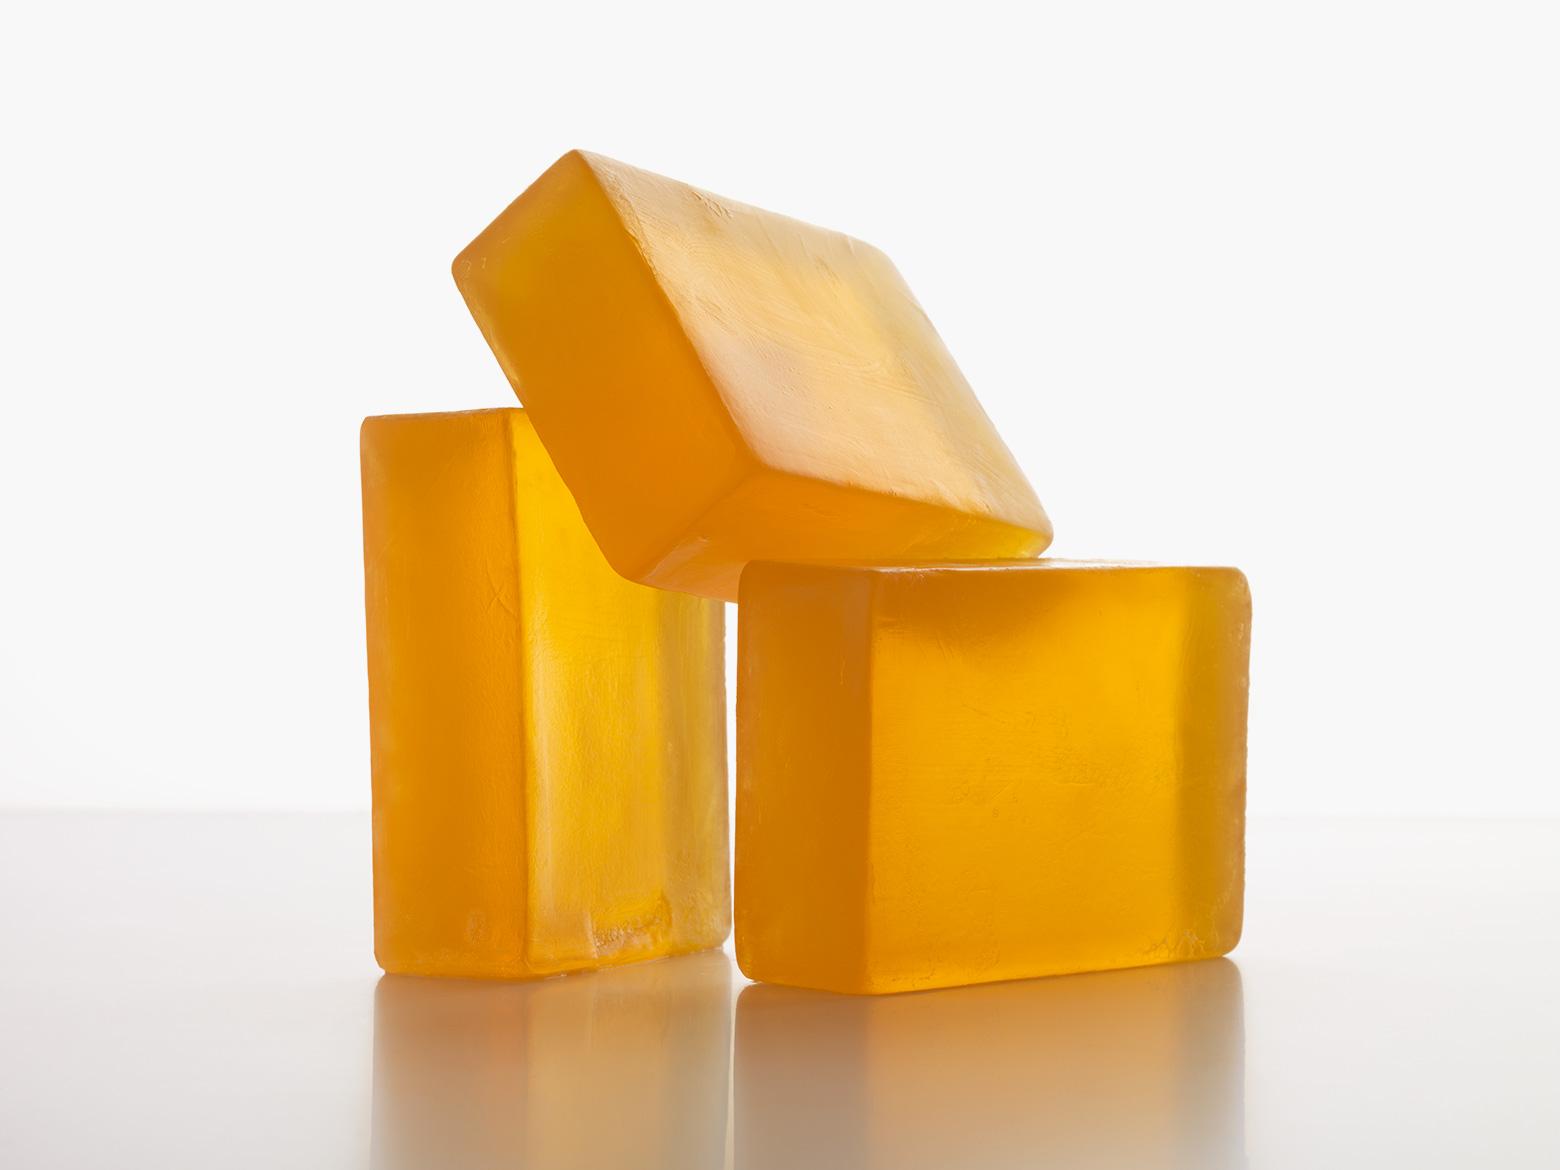 3.SP-R Thumb Soap-close-up_087.jpg